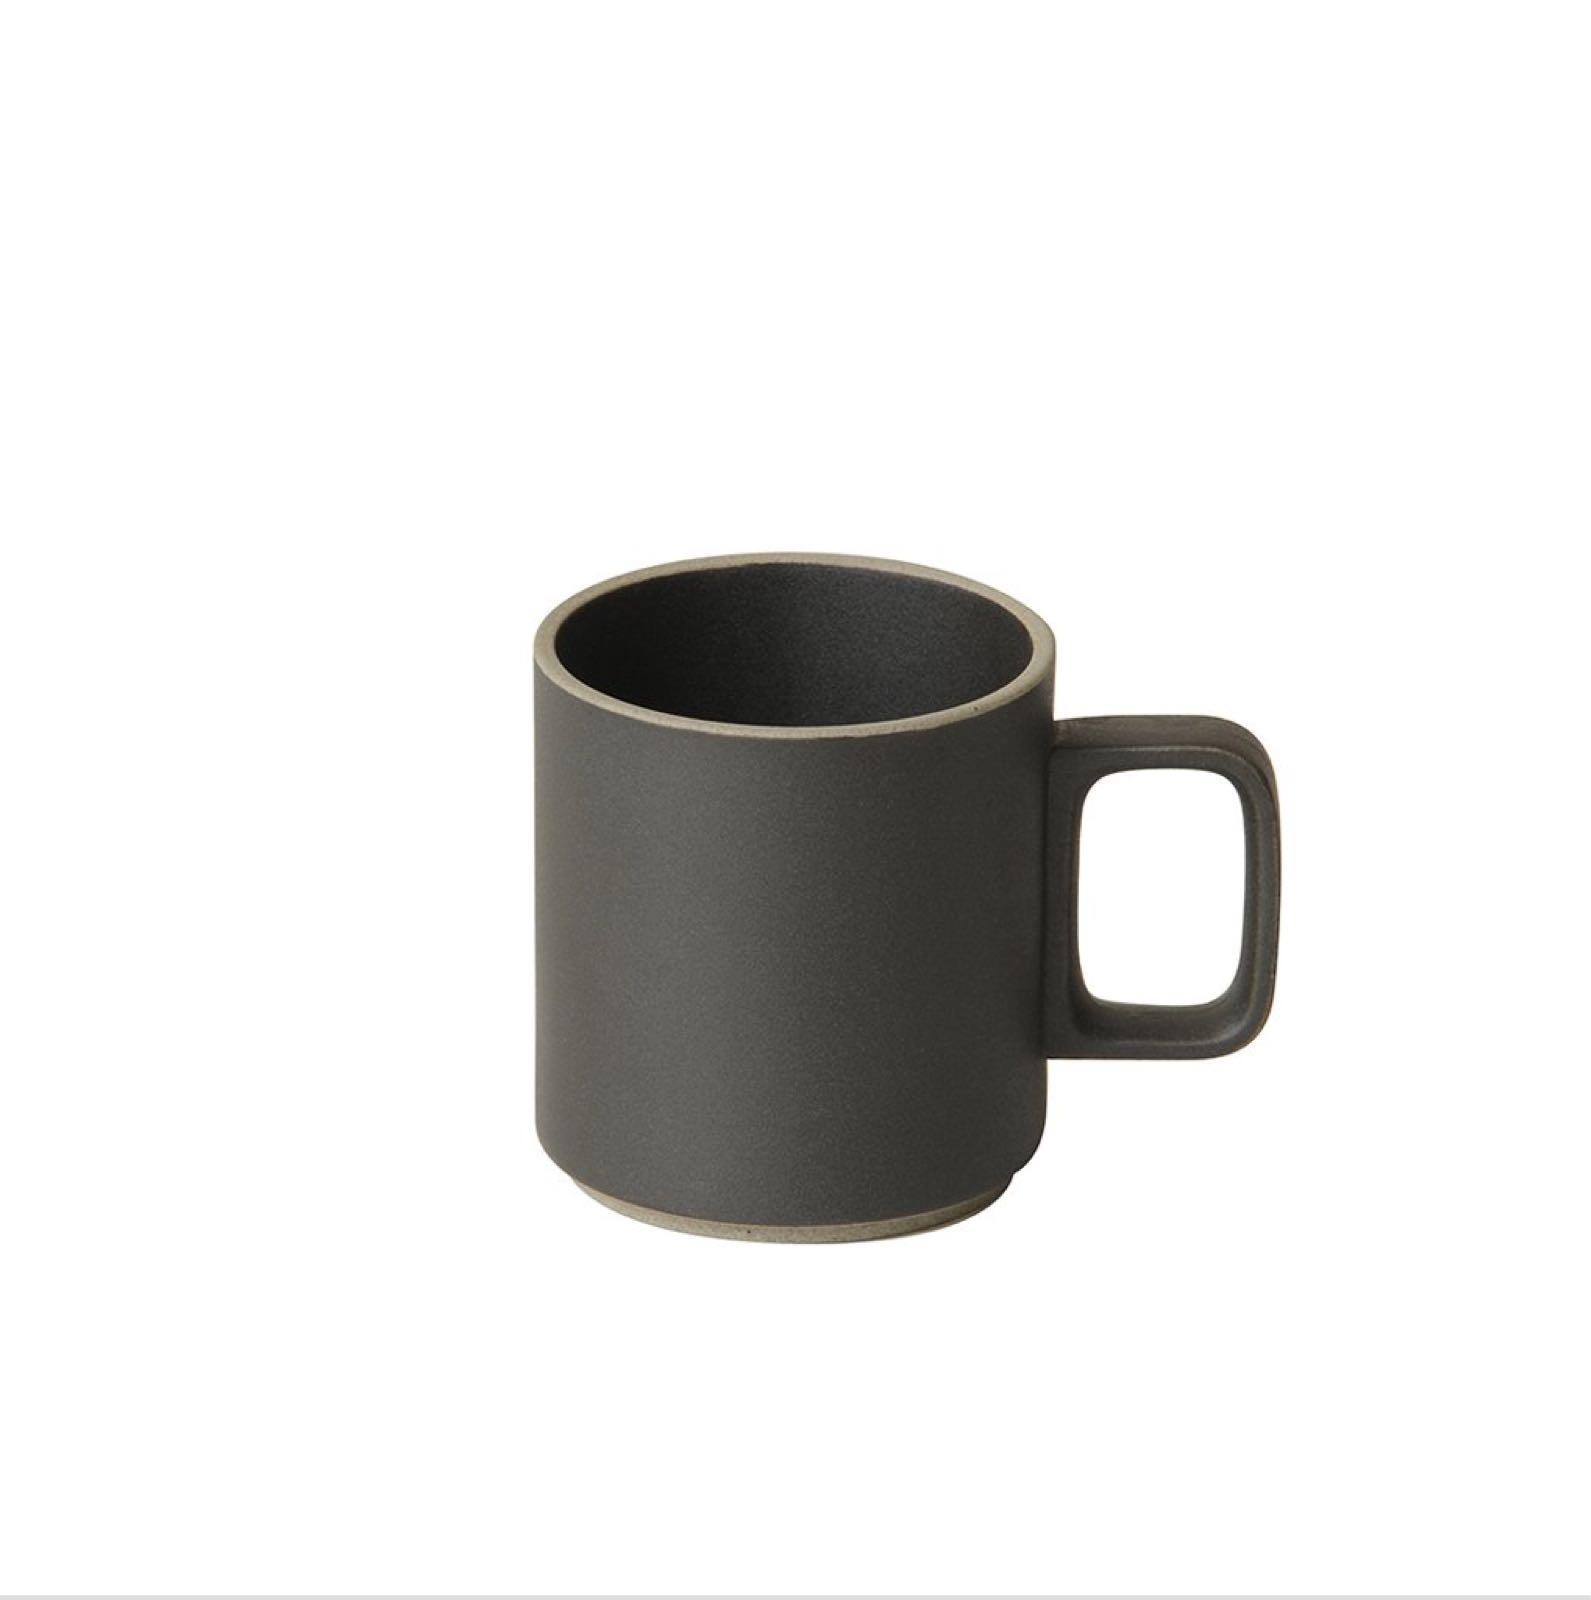 HPB020 Hasami Mug Cup medium black